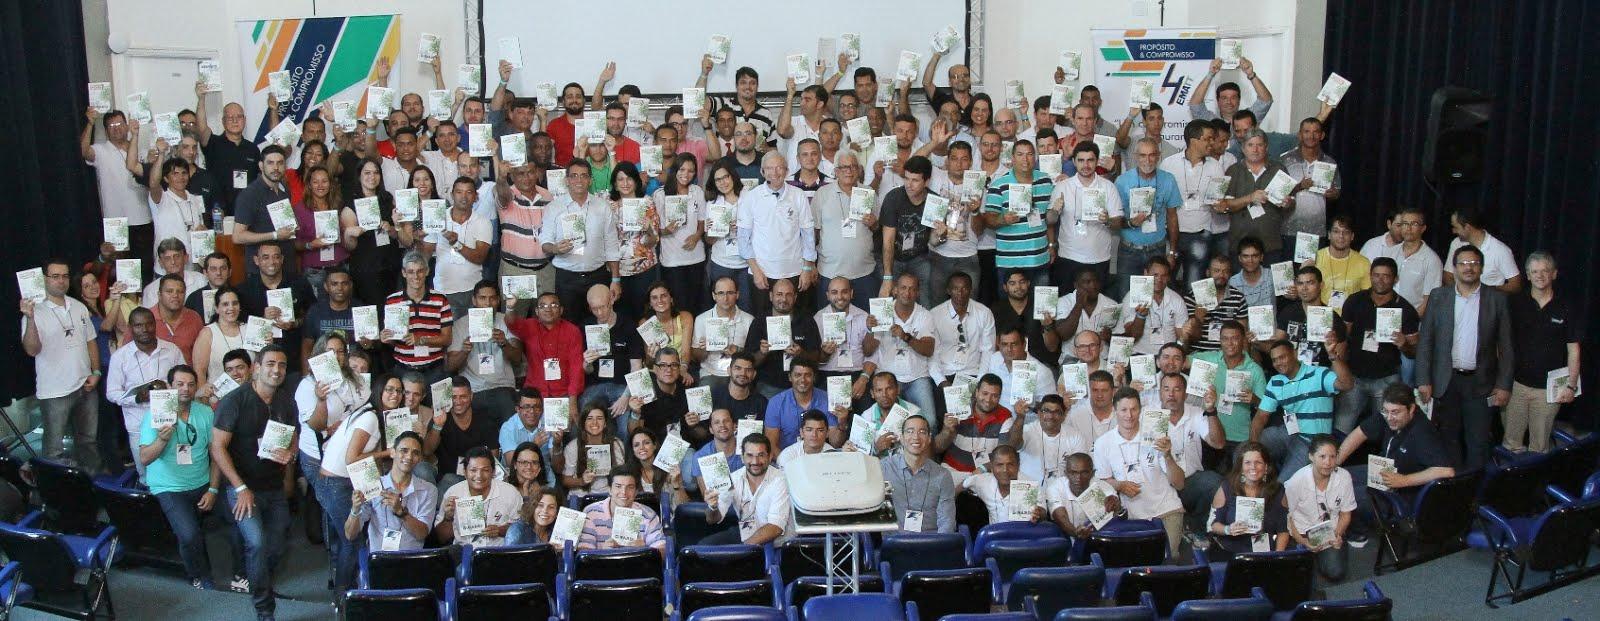 Palestra na TAESA em Brasília